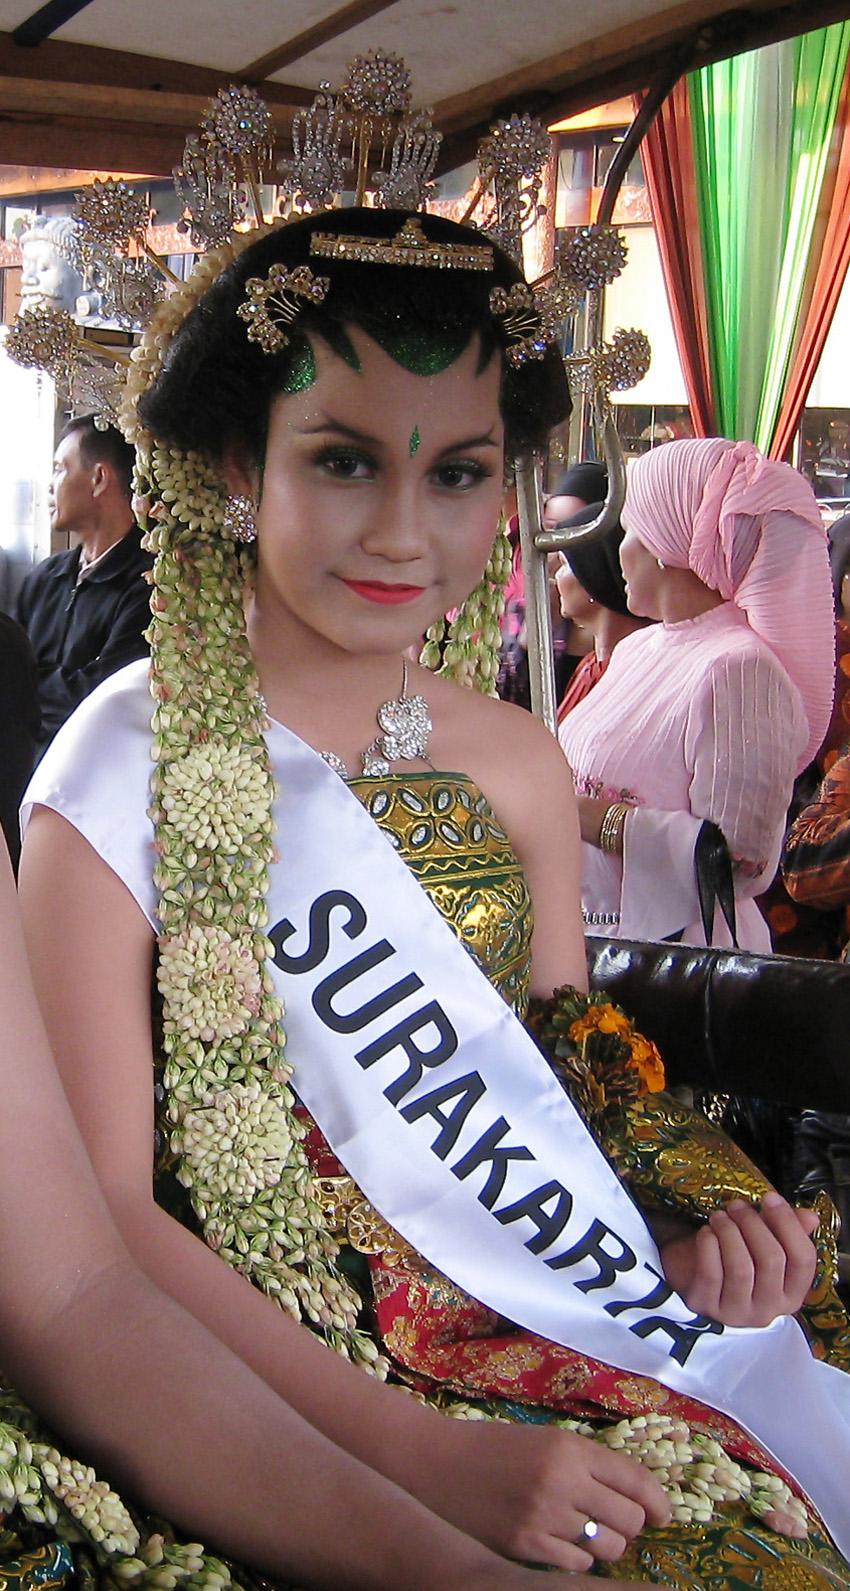 Surakarta dating